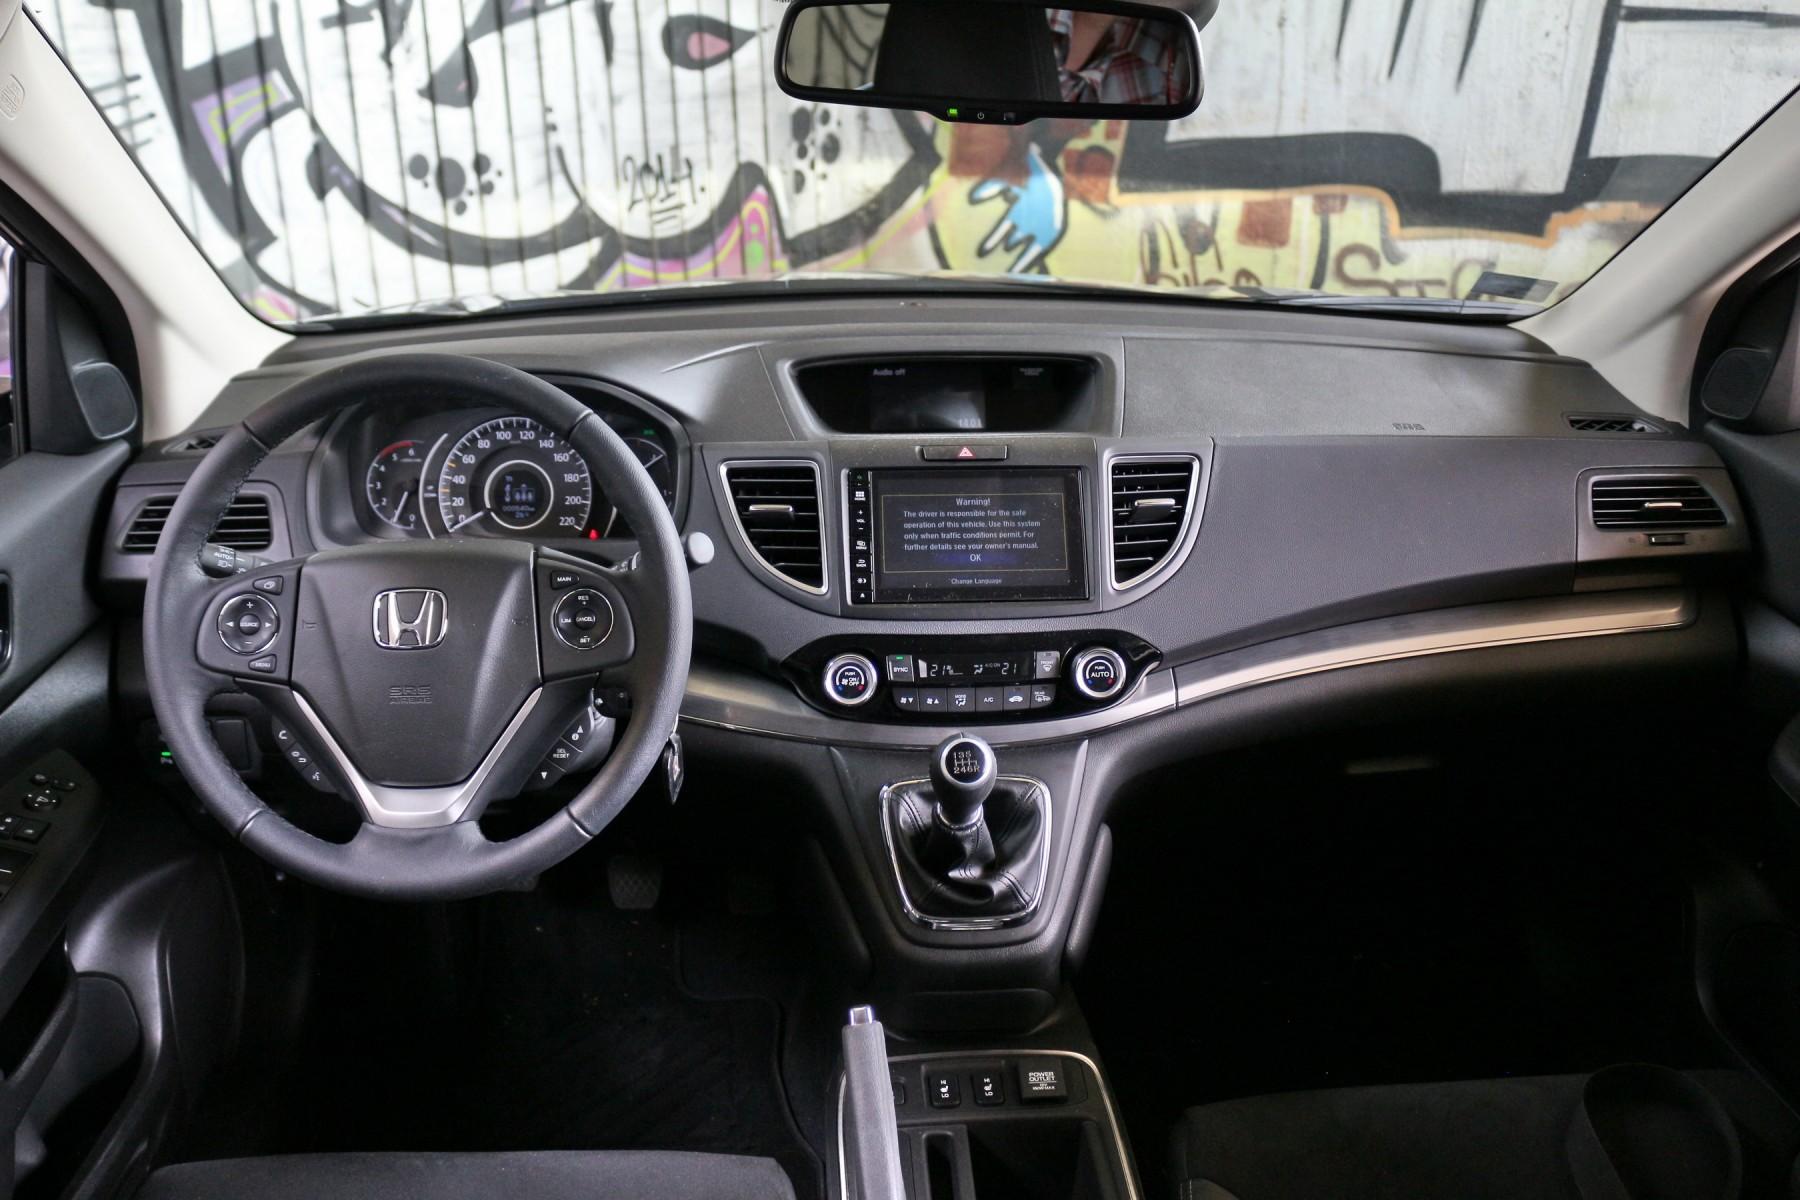 auto magazin srbija magazinauto.com honda cr-v i-dtec 160 4wd test